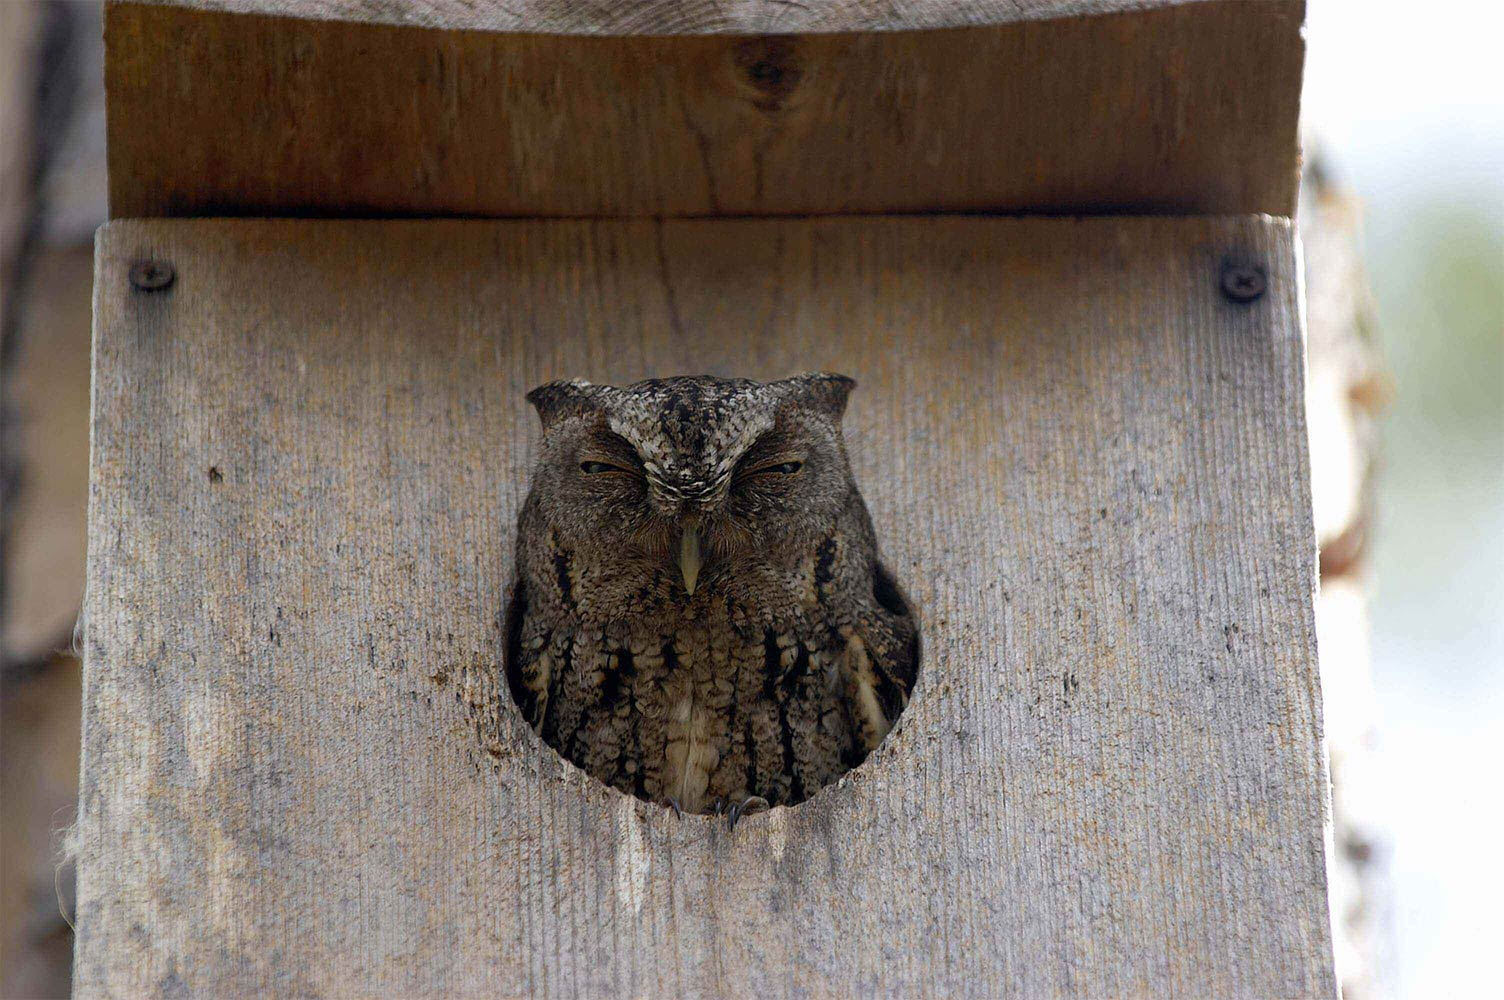 Owl in nest box